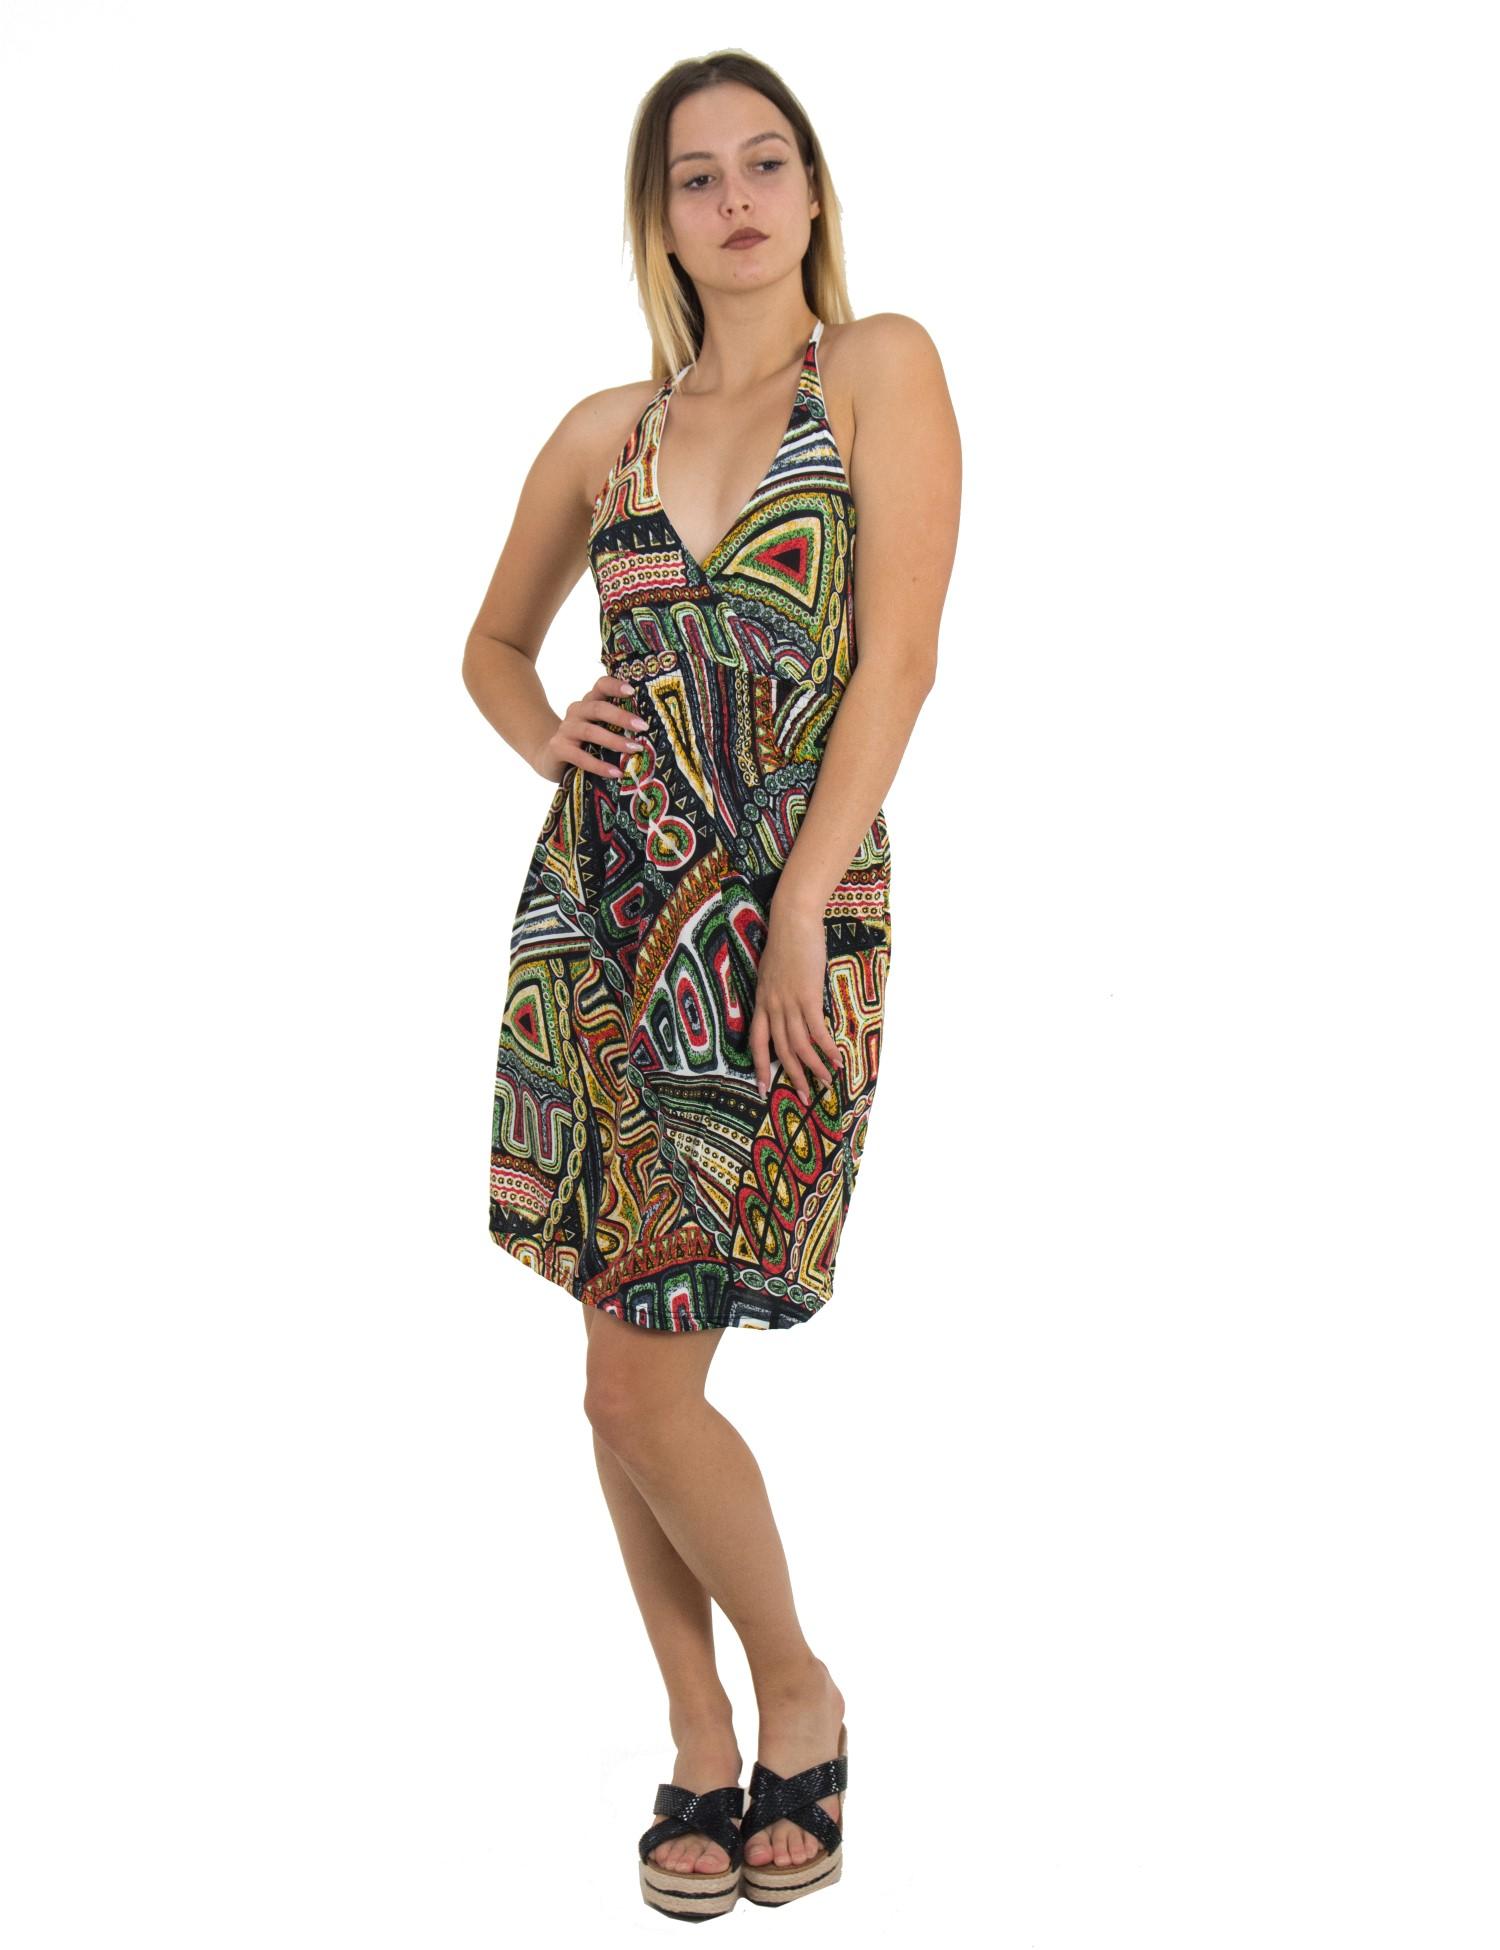 da5d539cdbcb Coocu Γυναικείο μαύρο εμπριμέ φόρεμα 167091681 - Glami.gr